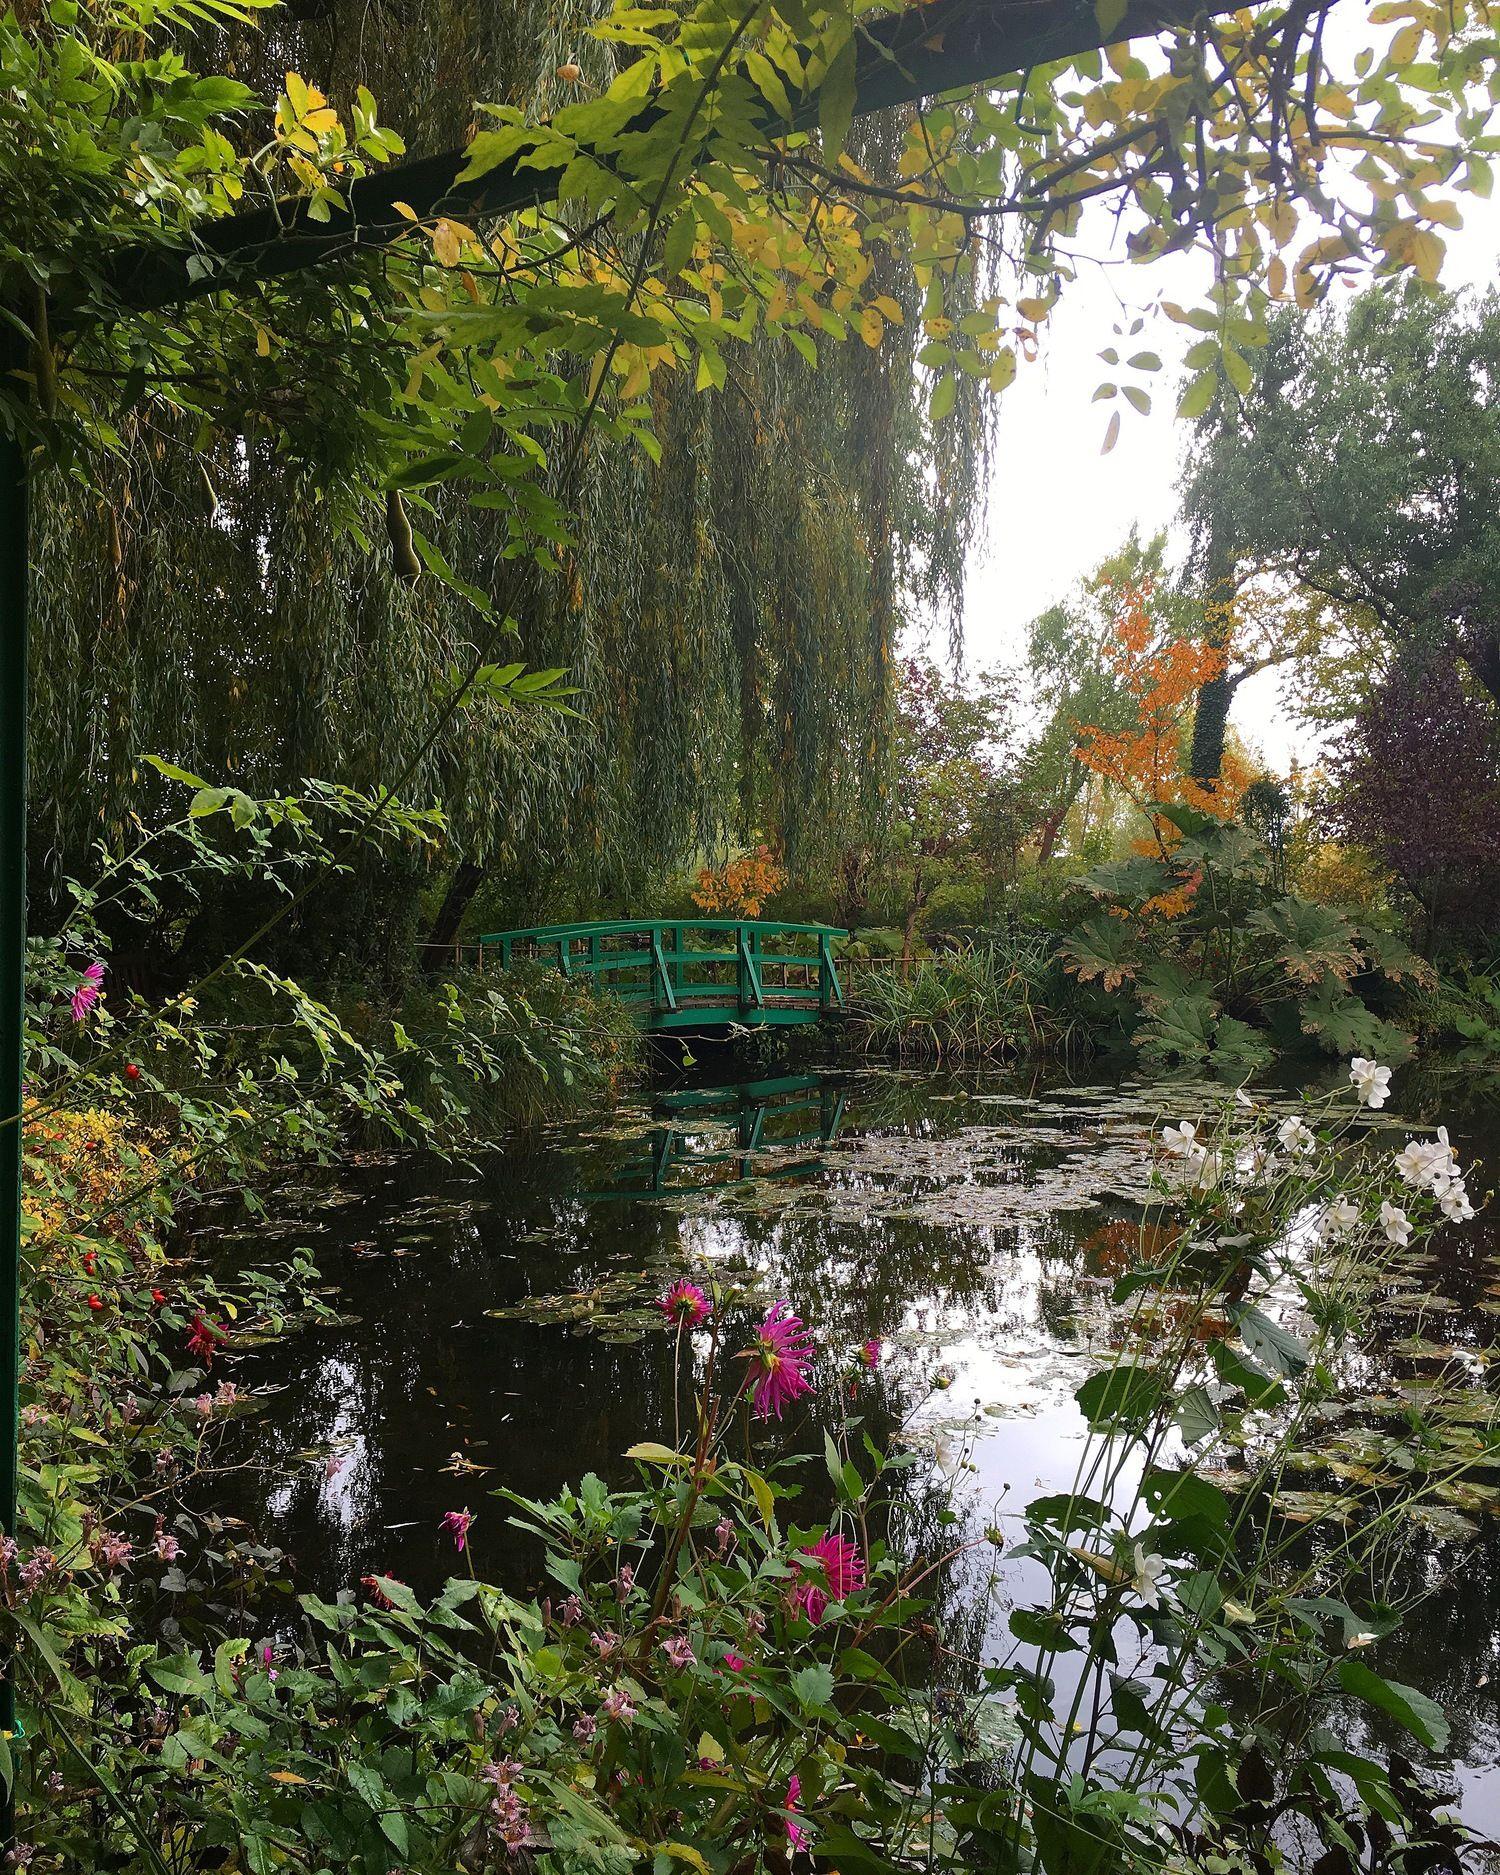 Monet's Lilly Pond